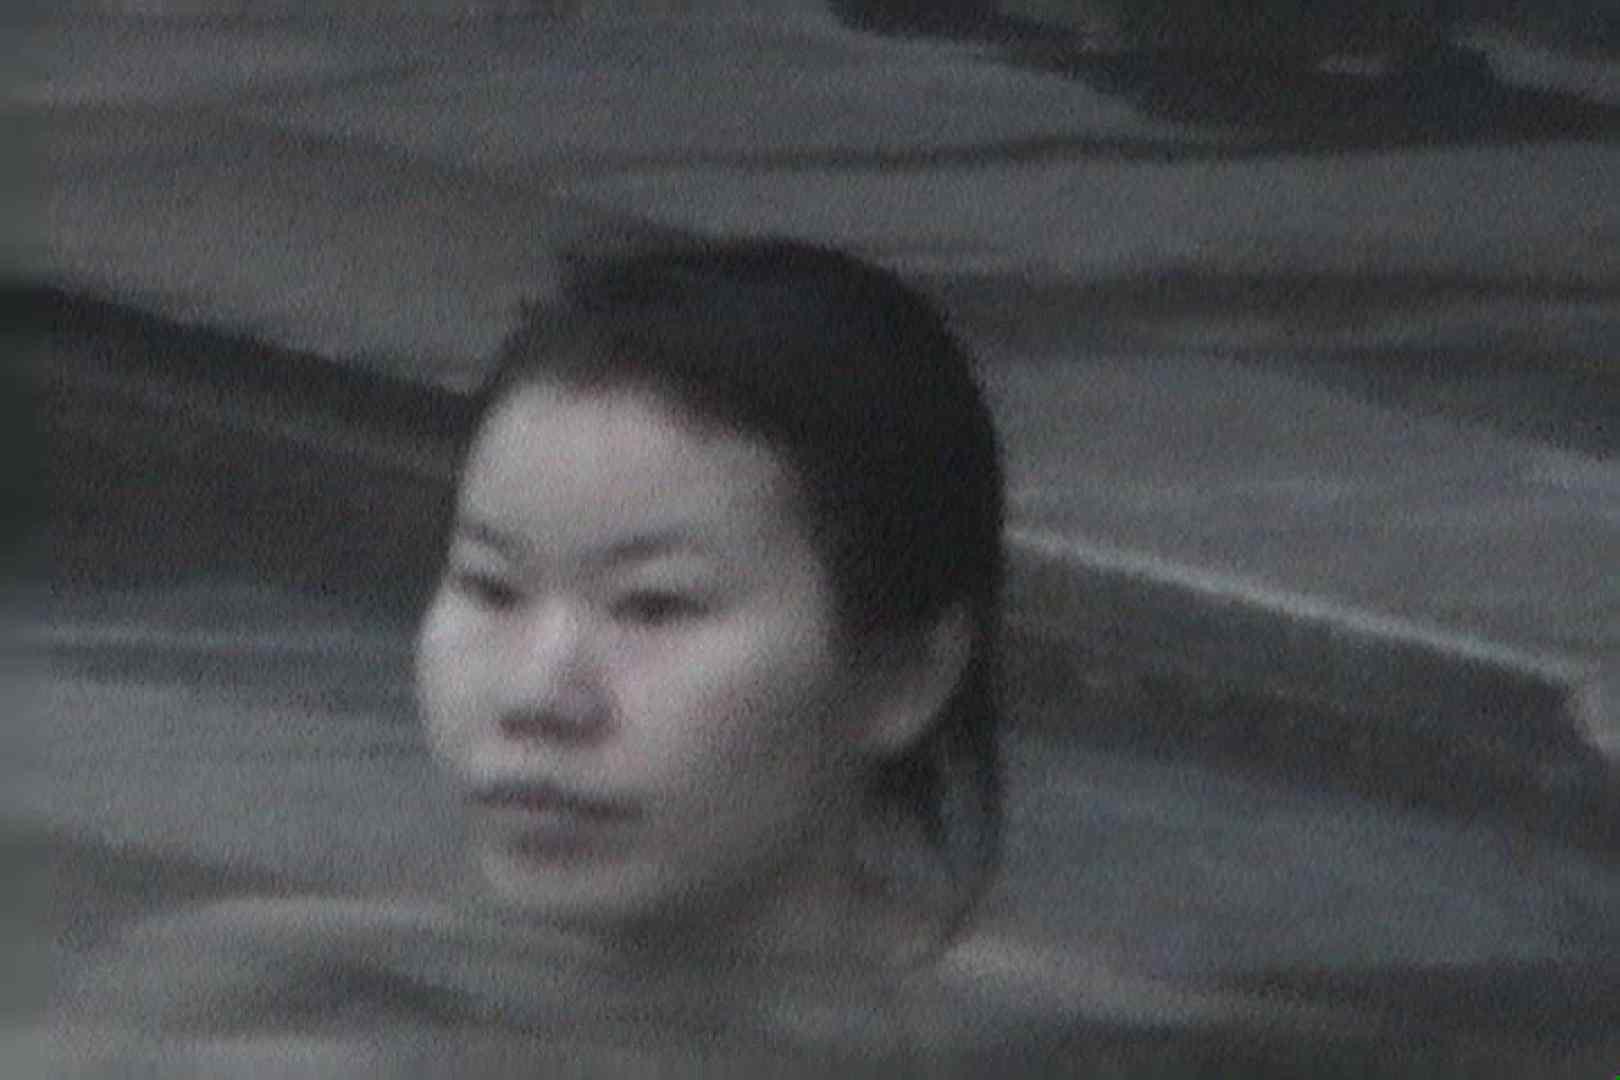 Aquaな露天風呂Vol.556 美しいOLの裸体 すけべAV動画紹介 69pic 68